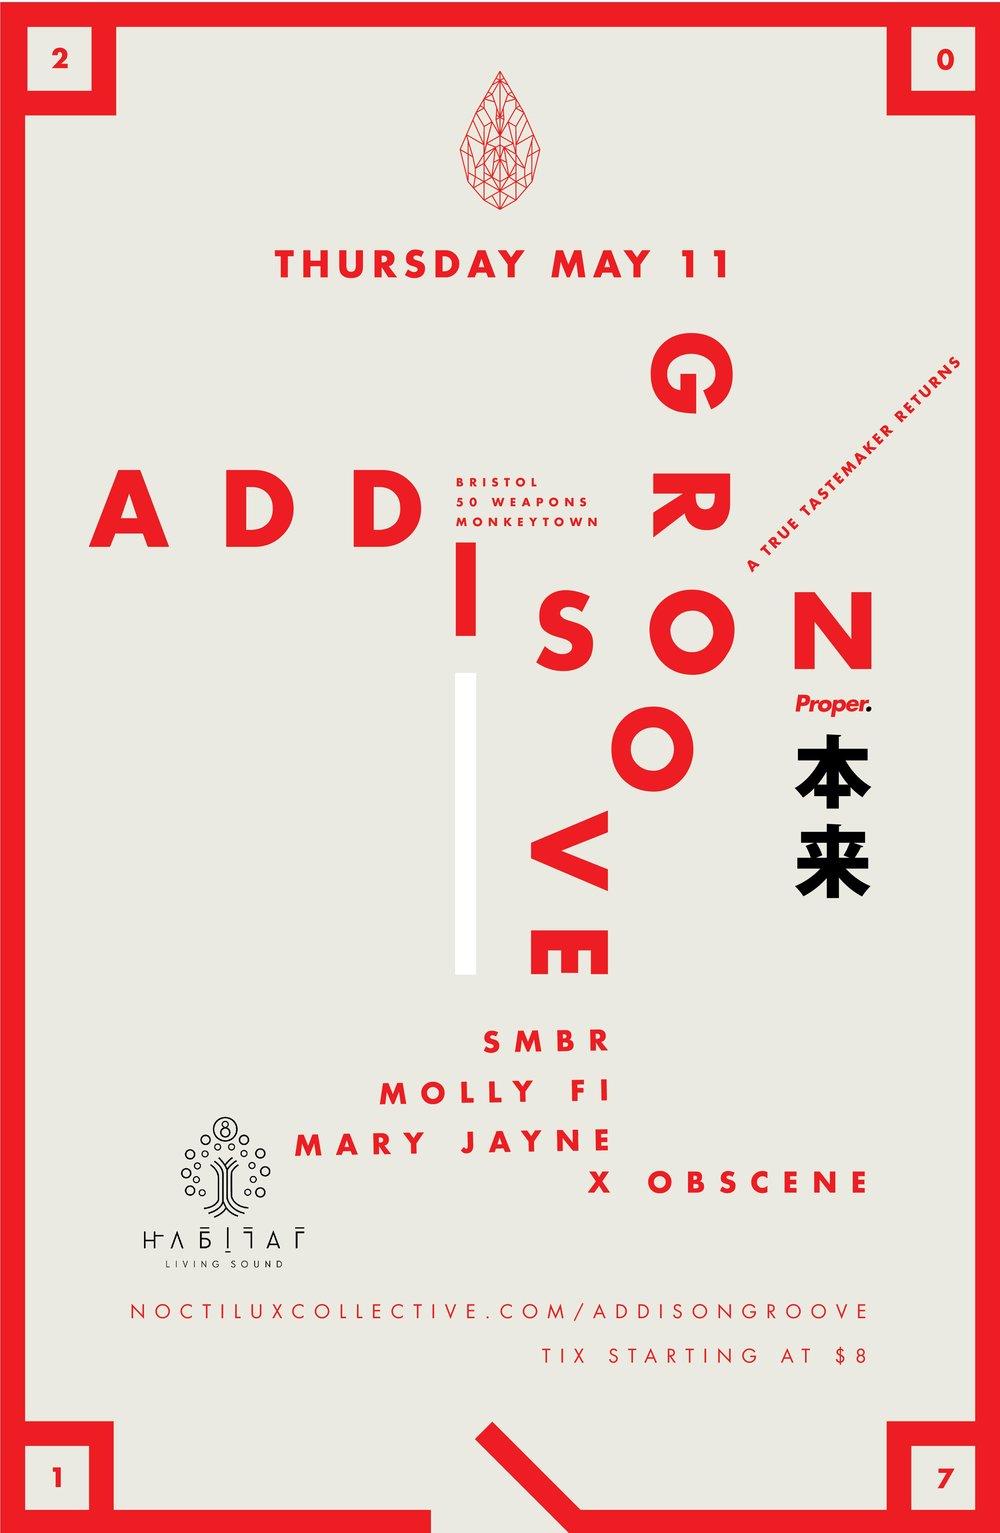 Addison-Groove-Habitat-Noctilux-Collective.jpeg